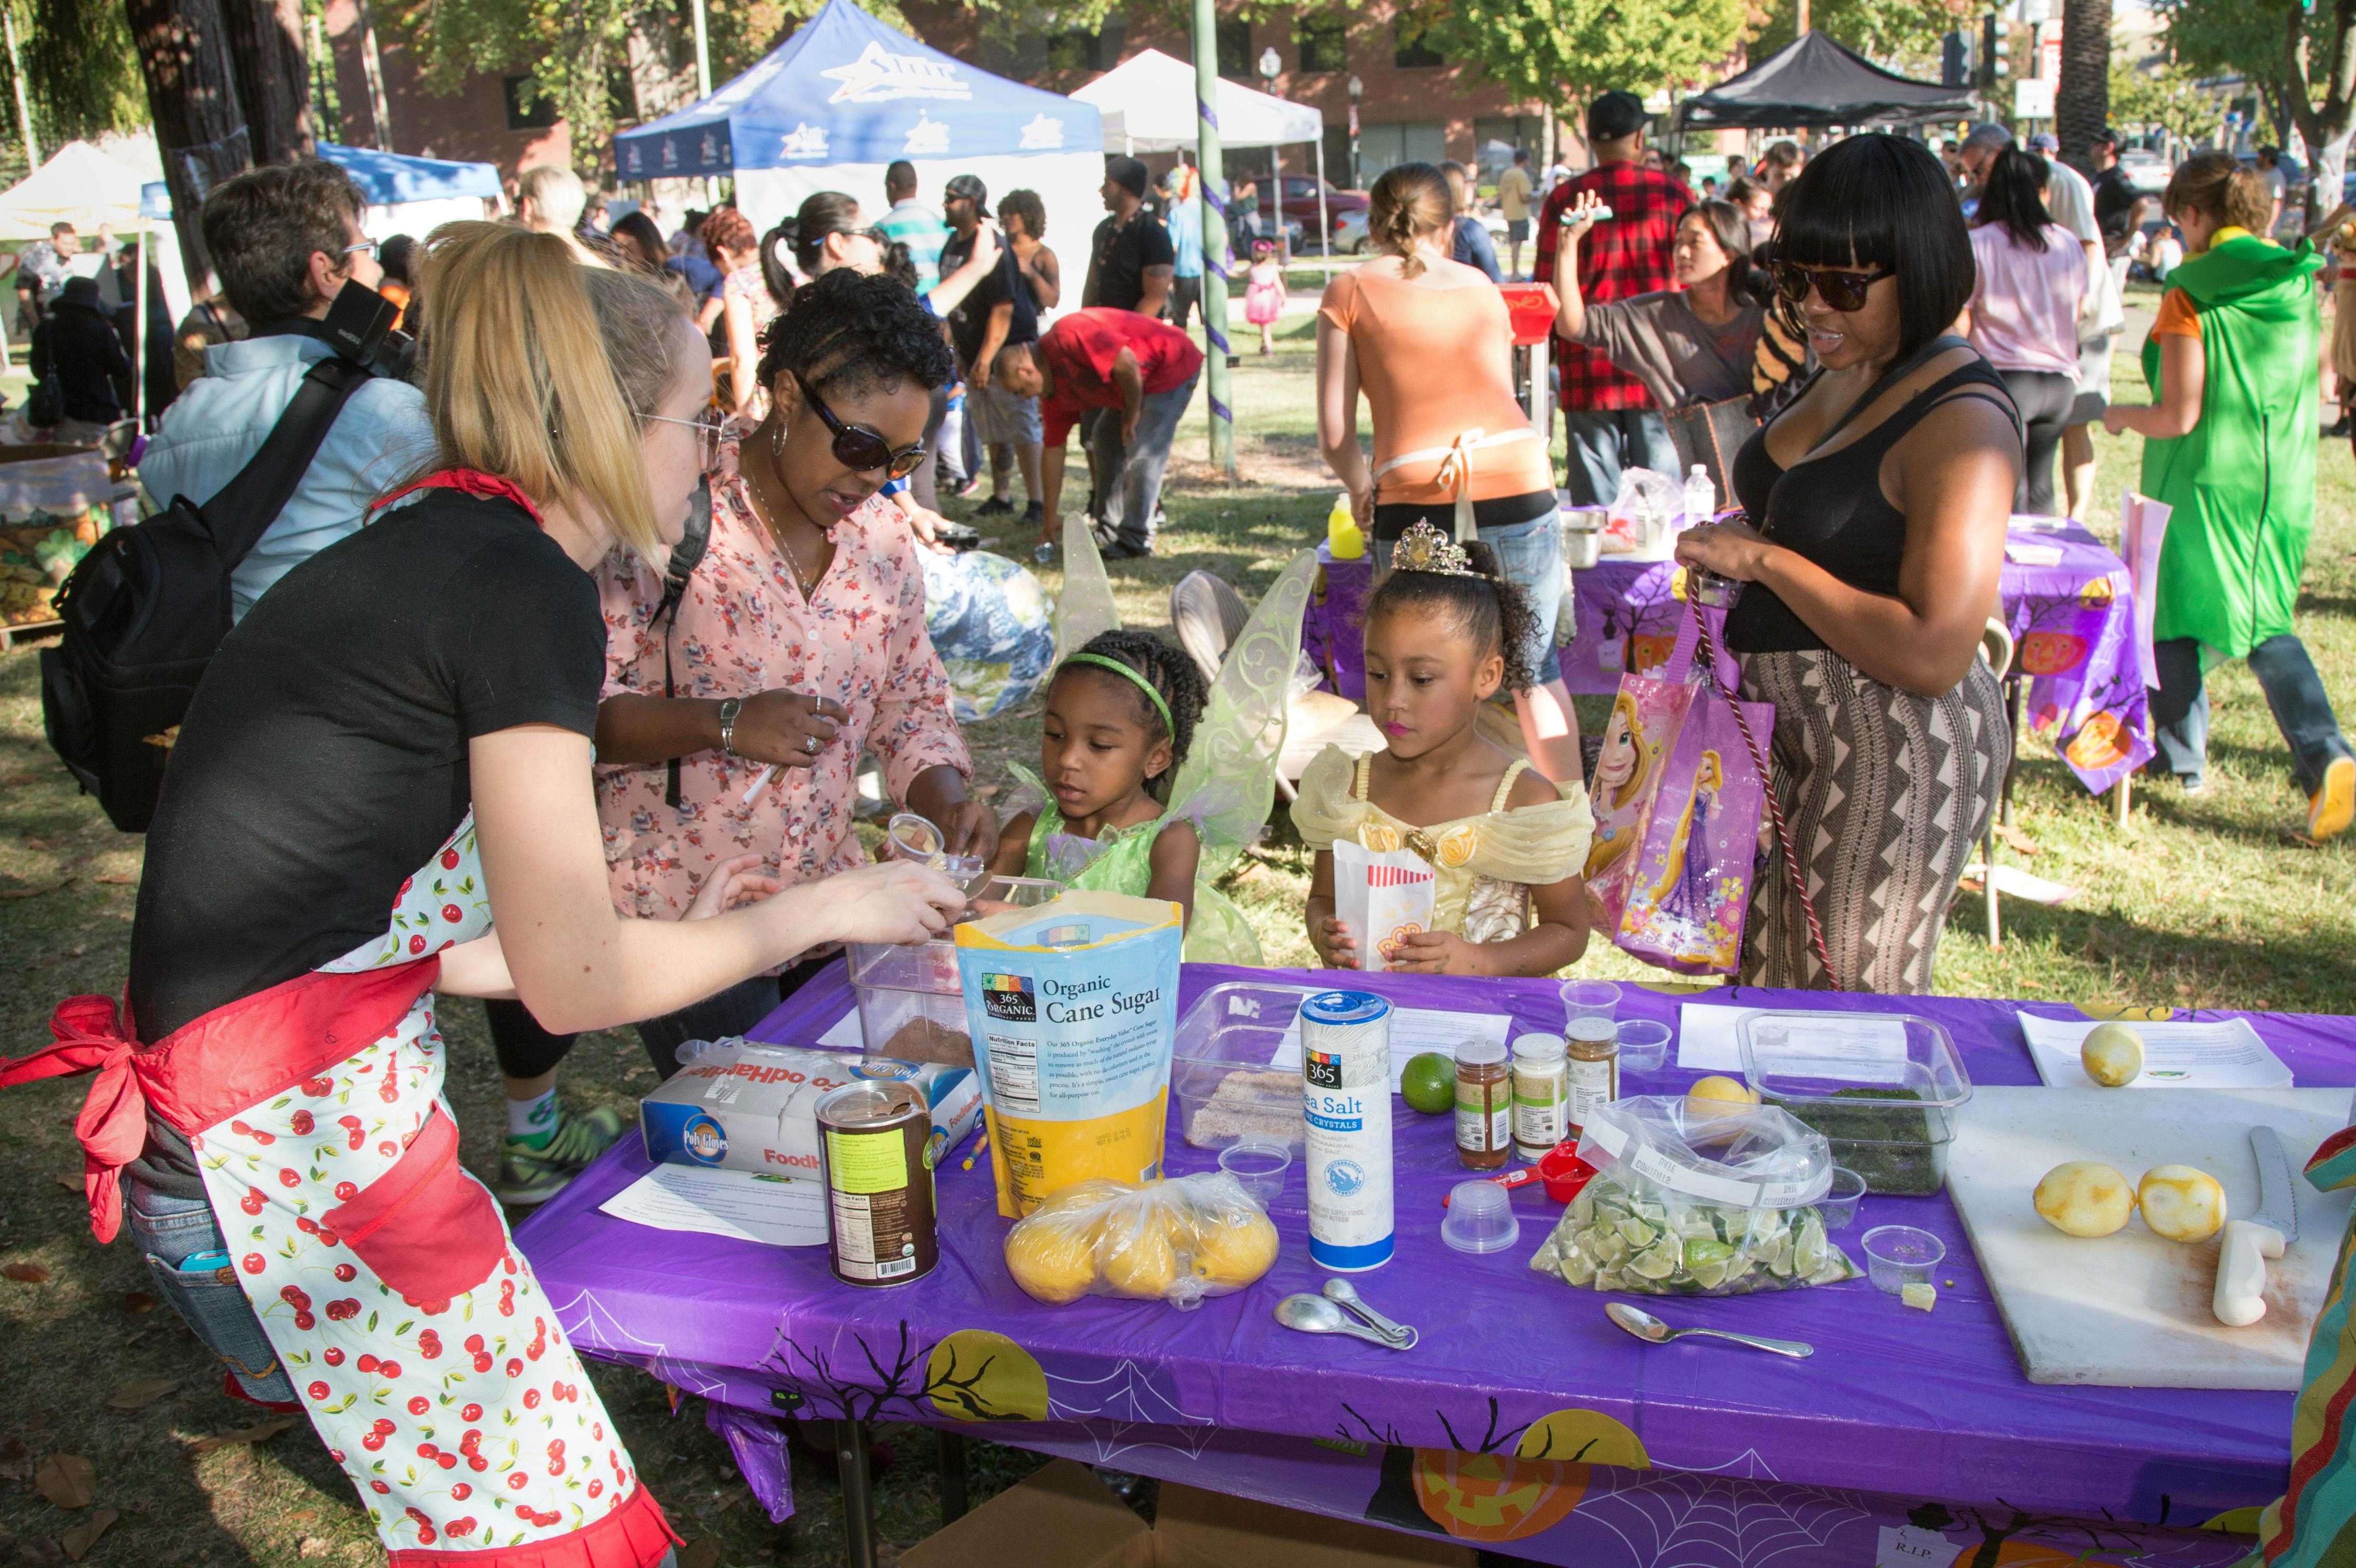 city vendor halloween bazaar market public space picnic kids festival dogs fair midtown costumes sacramento mitchellpark